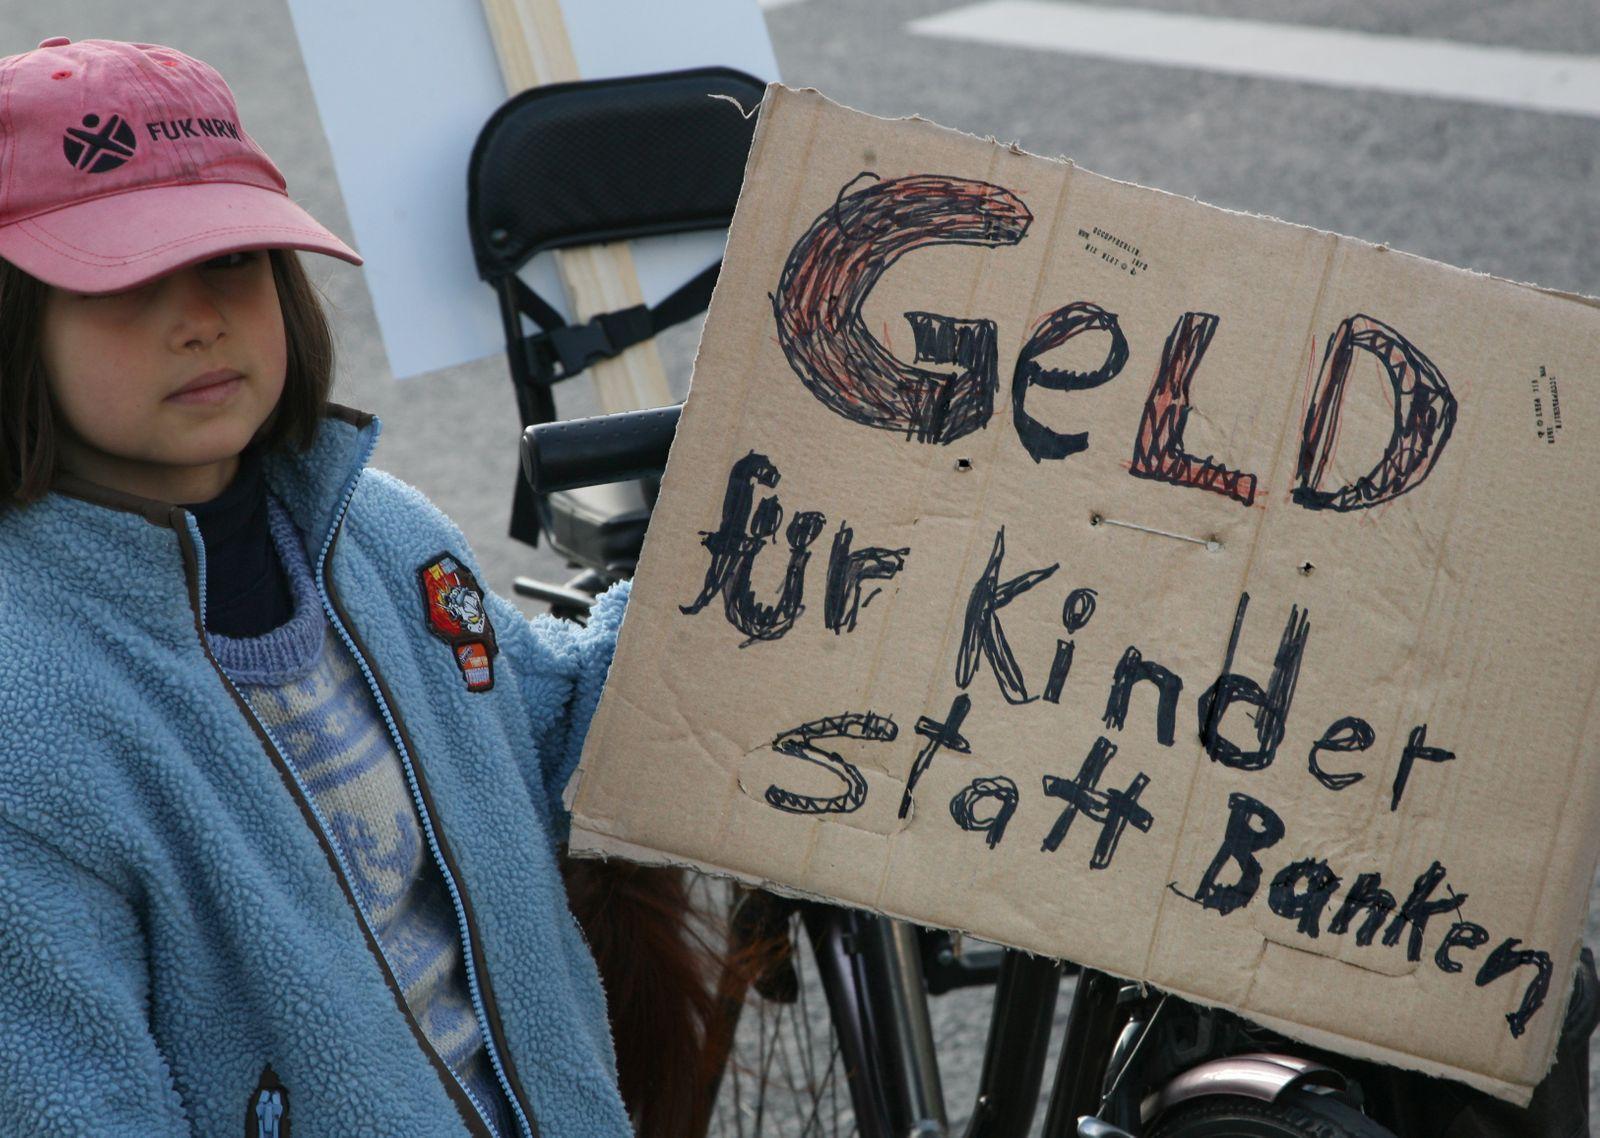 Kapitalismus-Kritiker demonstrieren in Berlin